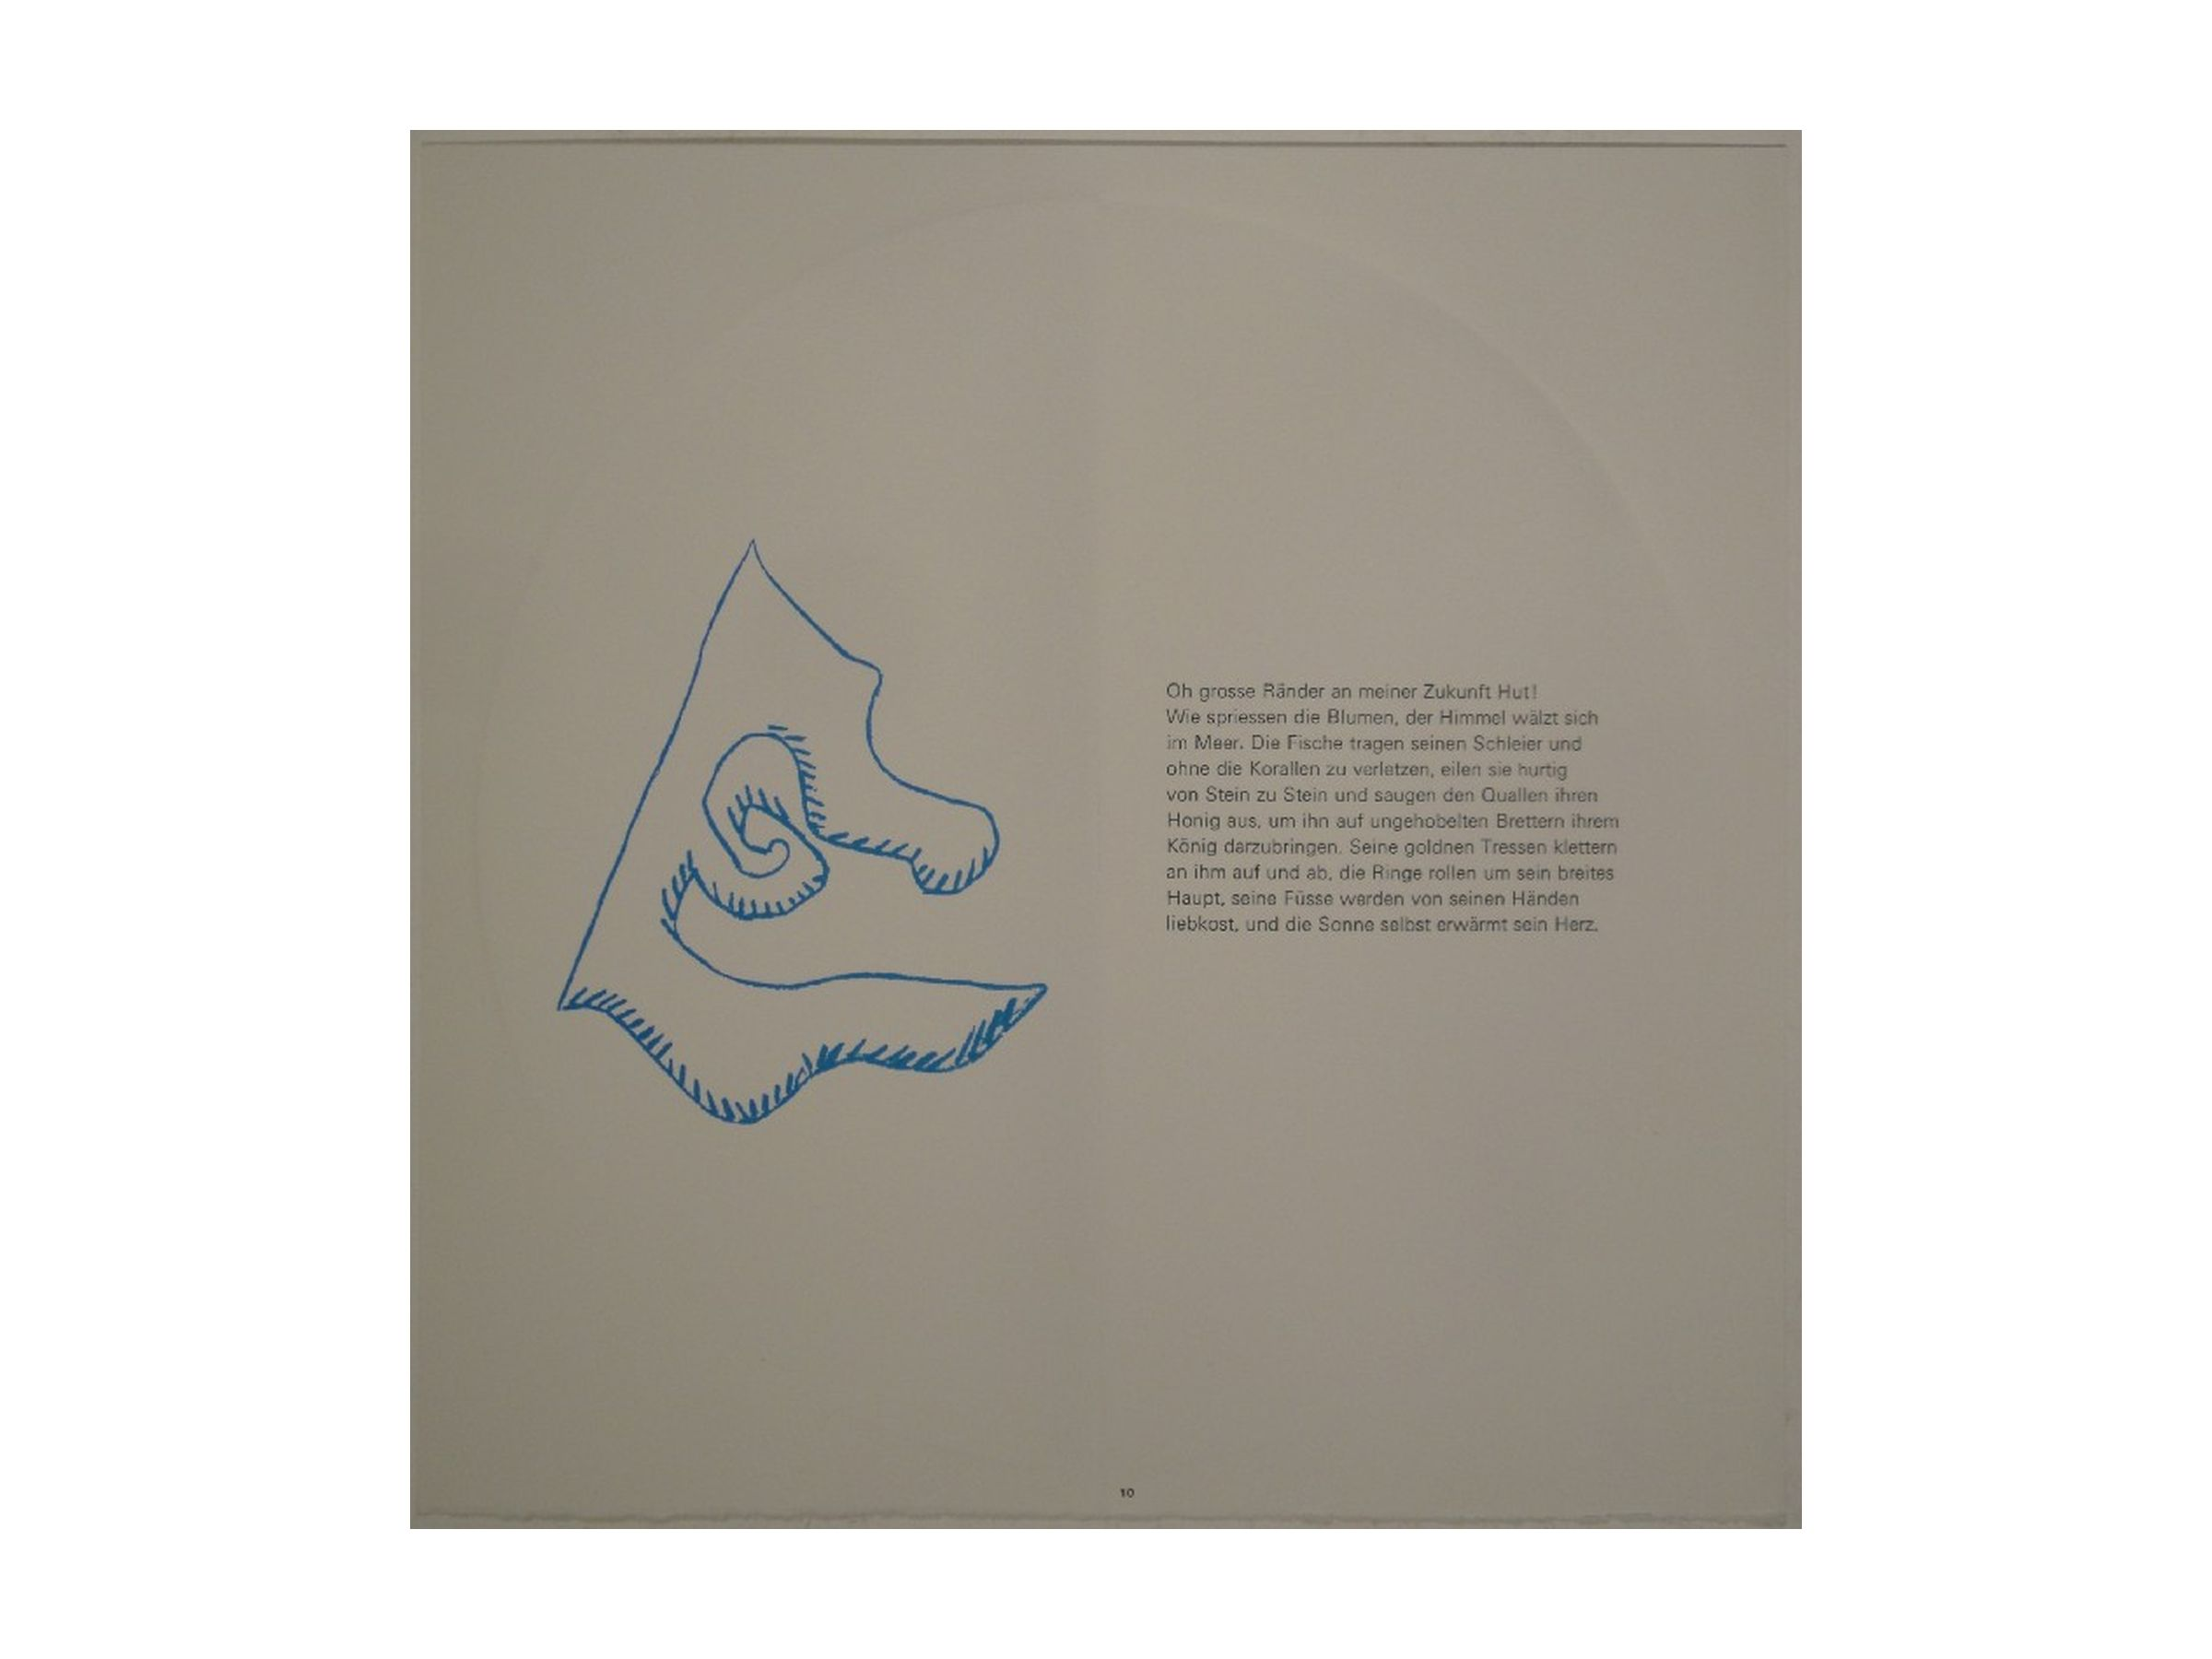 Oppenheim-Sansibar-carrousel-4